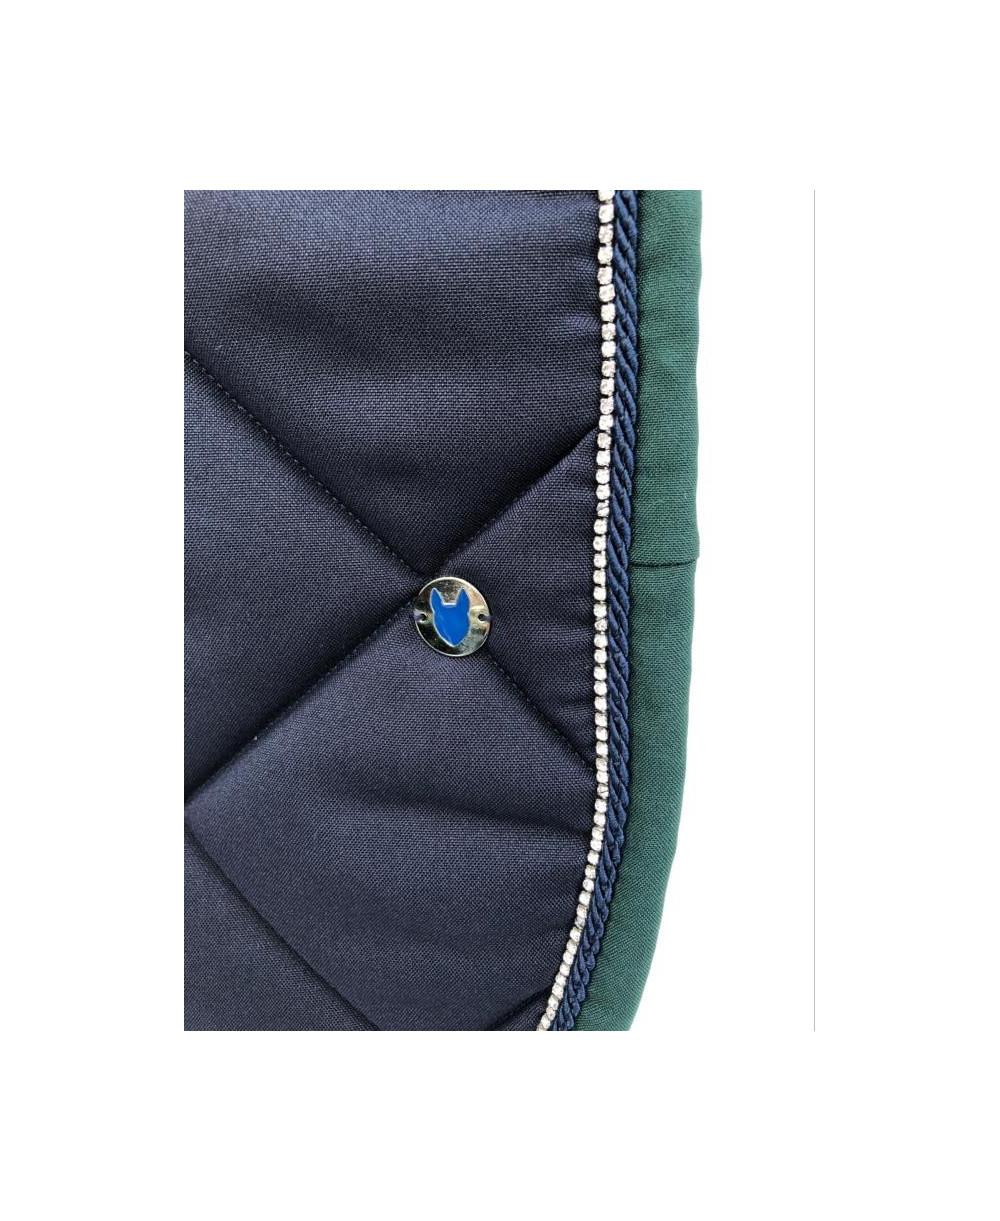 Tapis vente flash bleu horizon bord gris chiné tresse blanche, cordelette turquoise